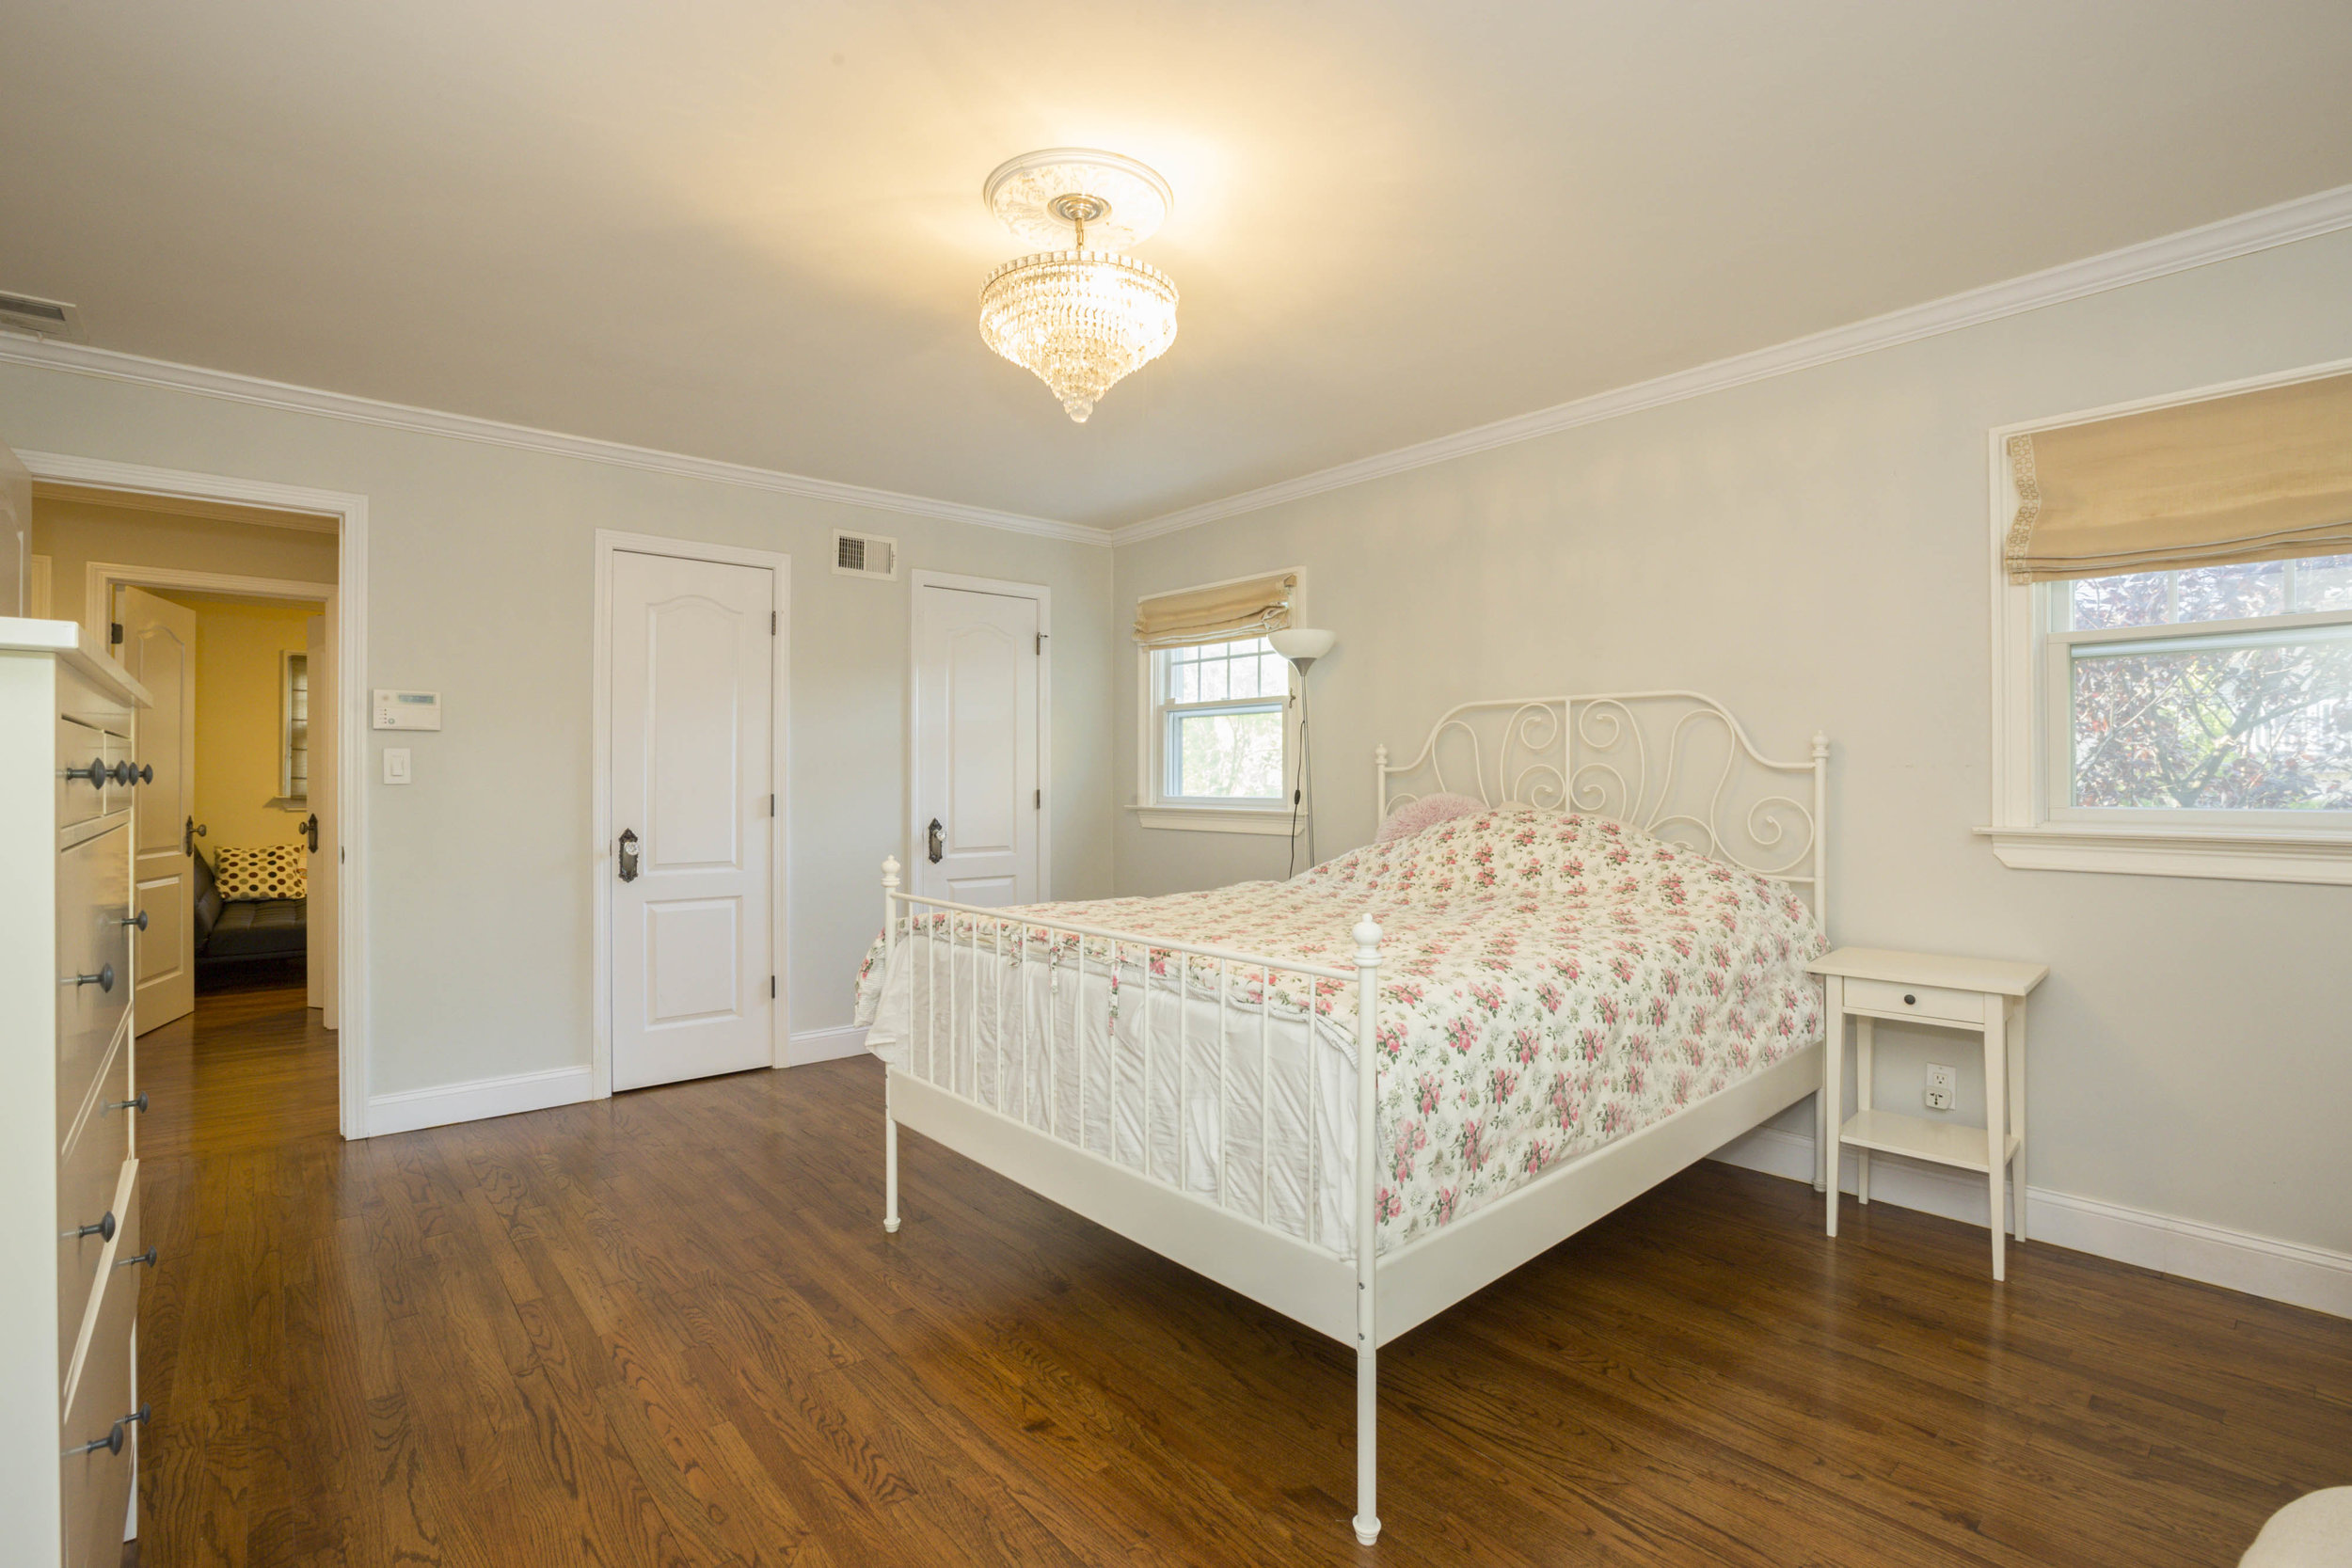 010_Bedroom .jpg